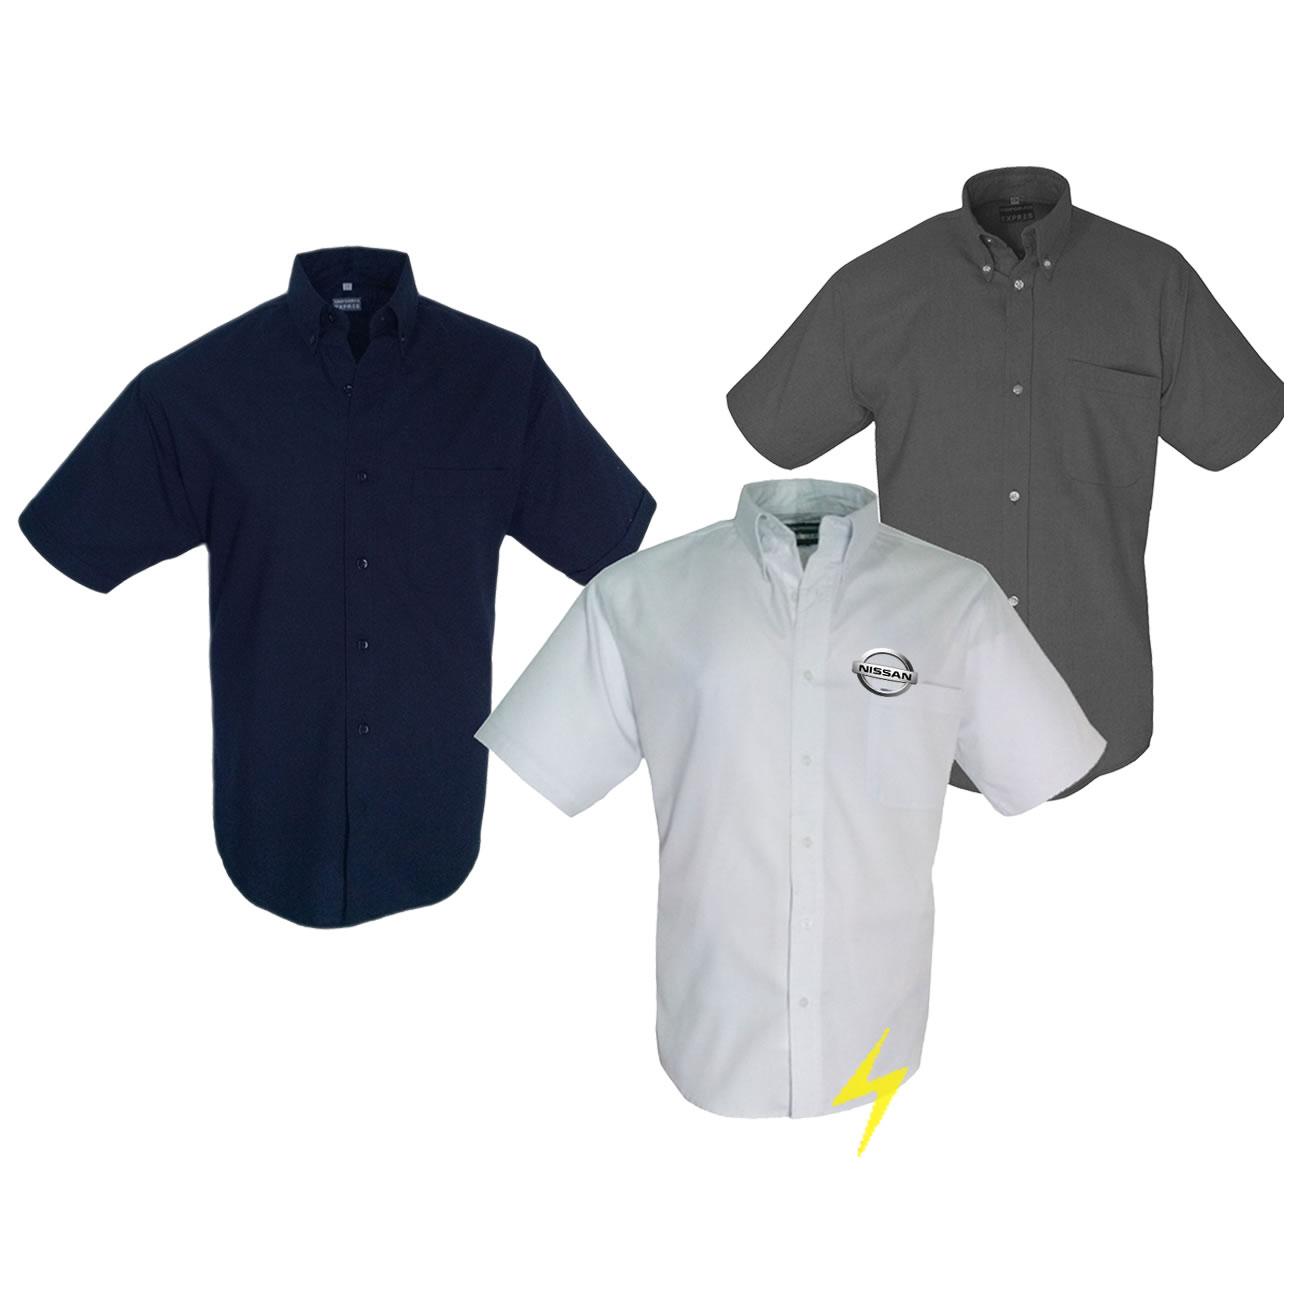 Camisas bordadas DF│Camisas para uniformes│Blusas│logos 7b9cbf6fa0601